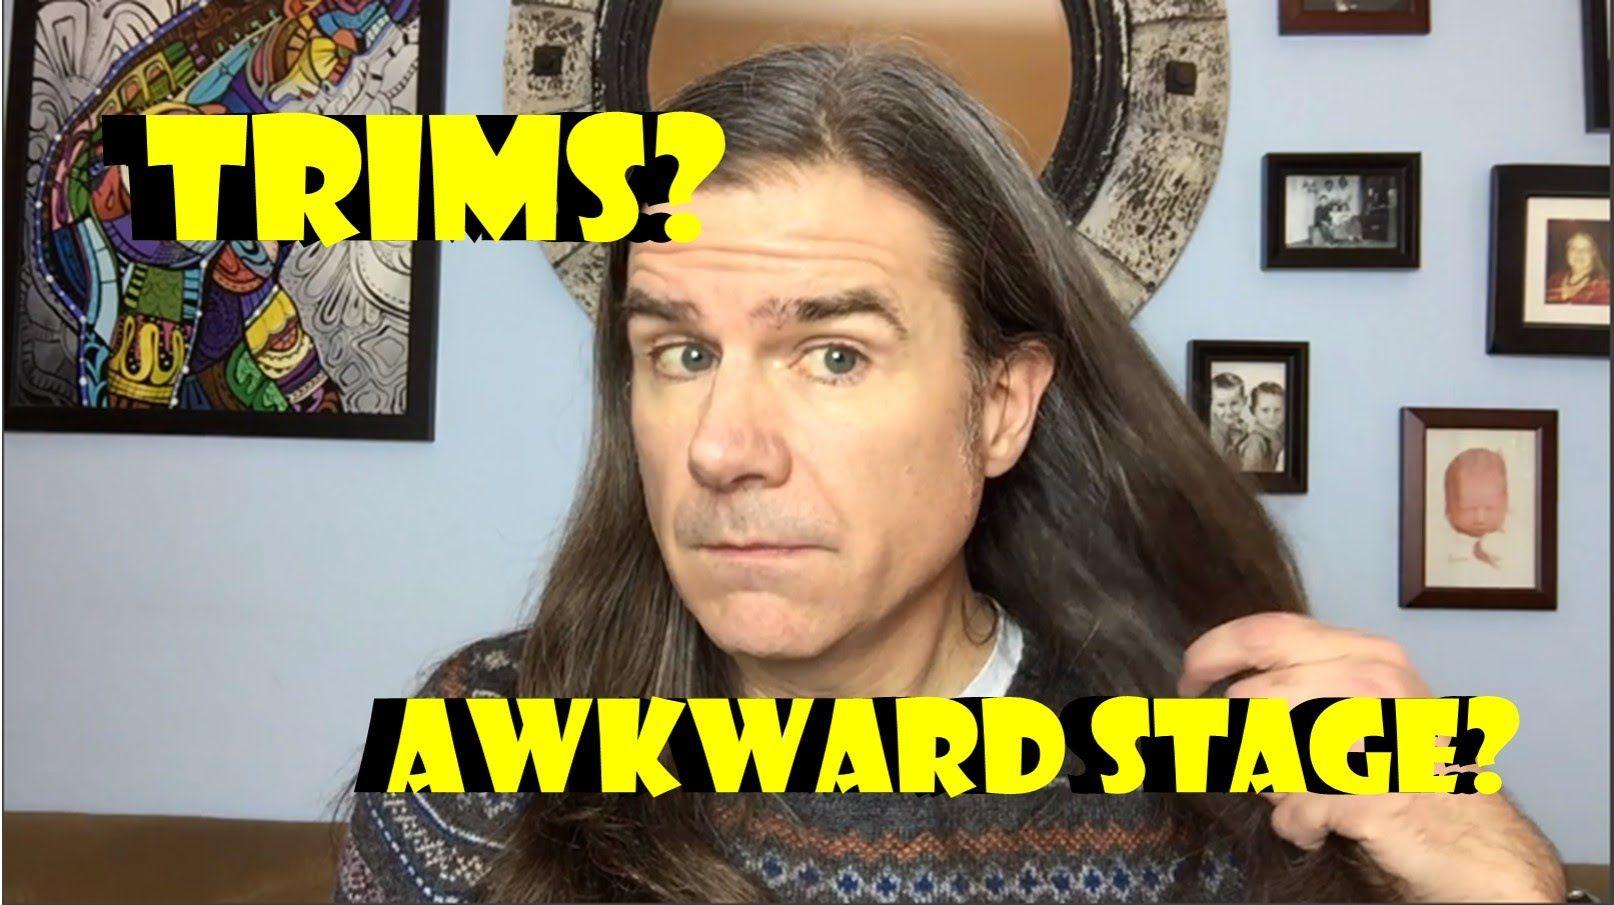 Men S Long Hair Haircuts While Growing The Awkward Stage Faqs Long Hair Styles Men Growing Long Hair Men Growing Out Hair